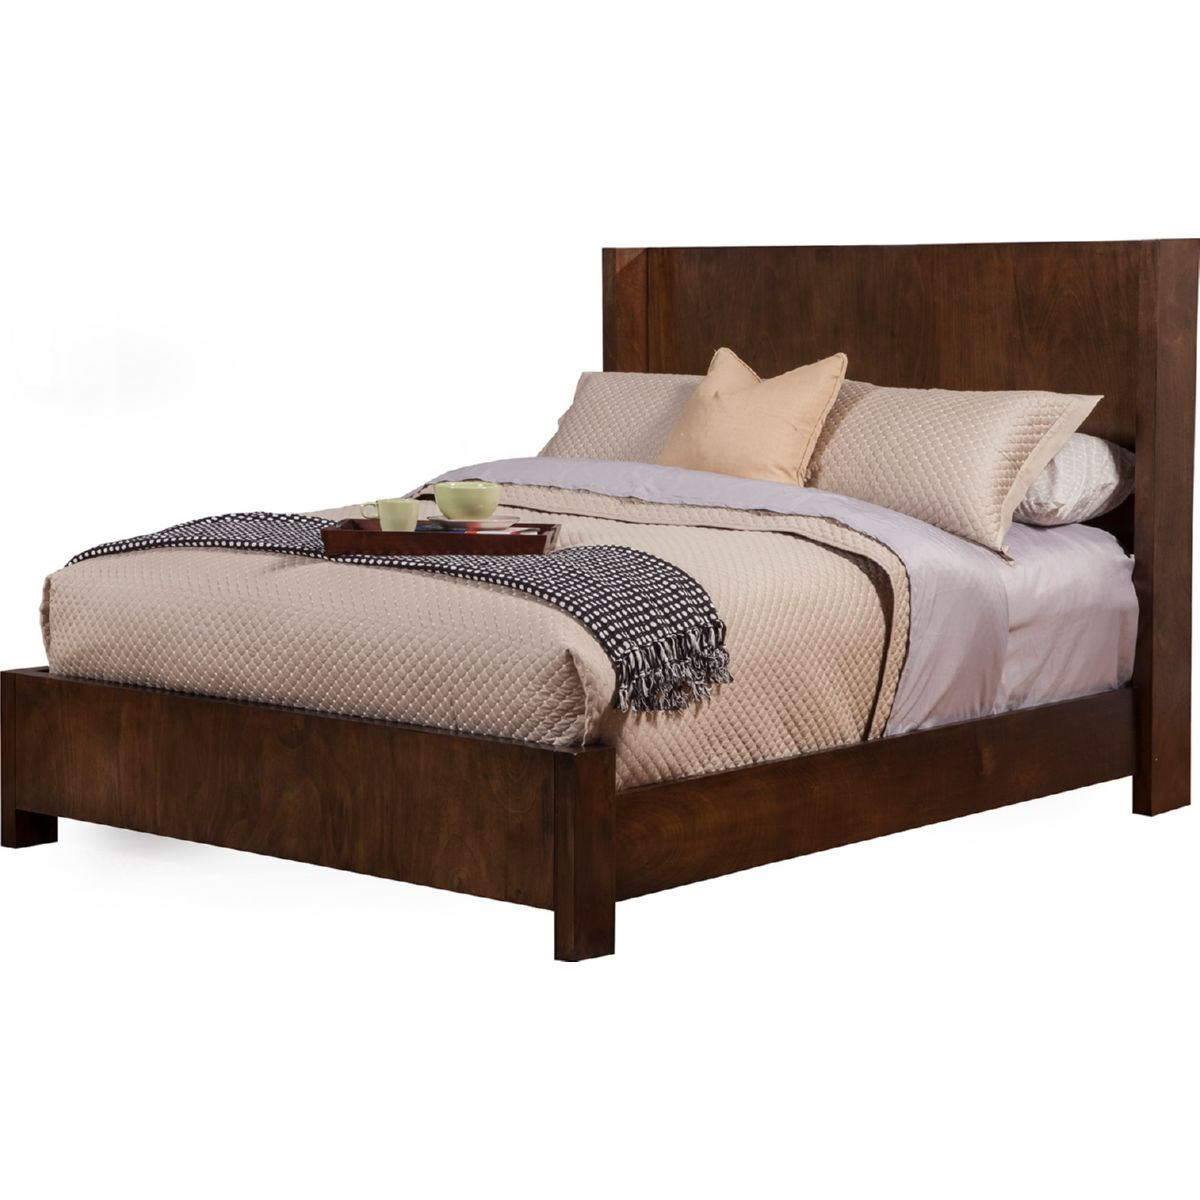 Austin Full Size Shelter Panel Bed In Chestnut Finish Mahogany U0026 Okoume  Veneer